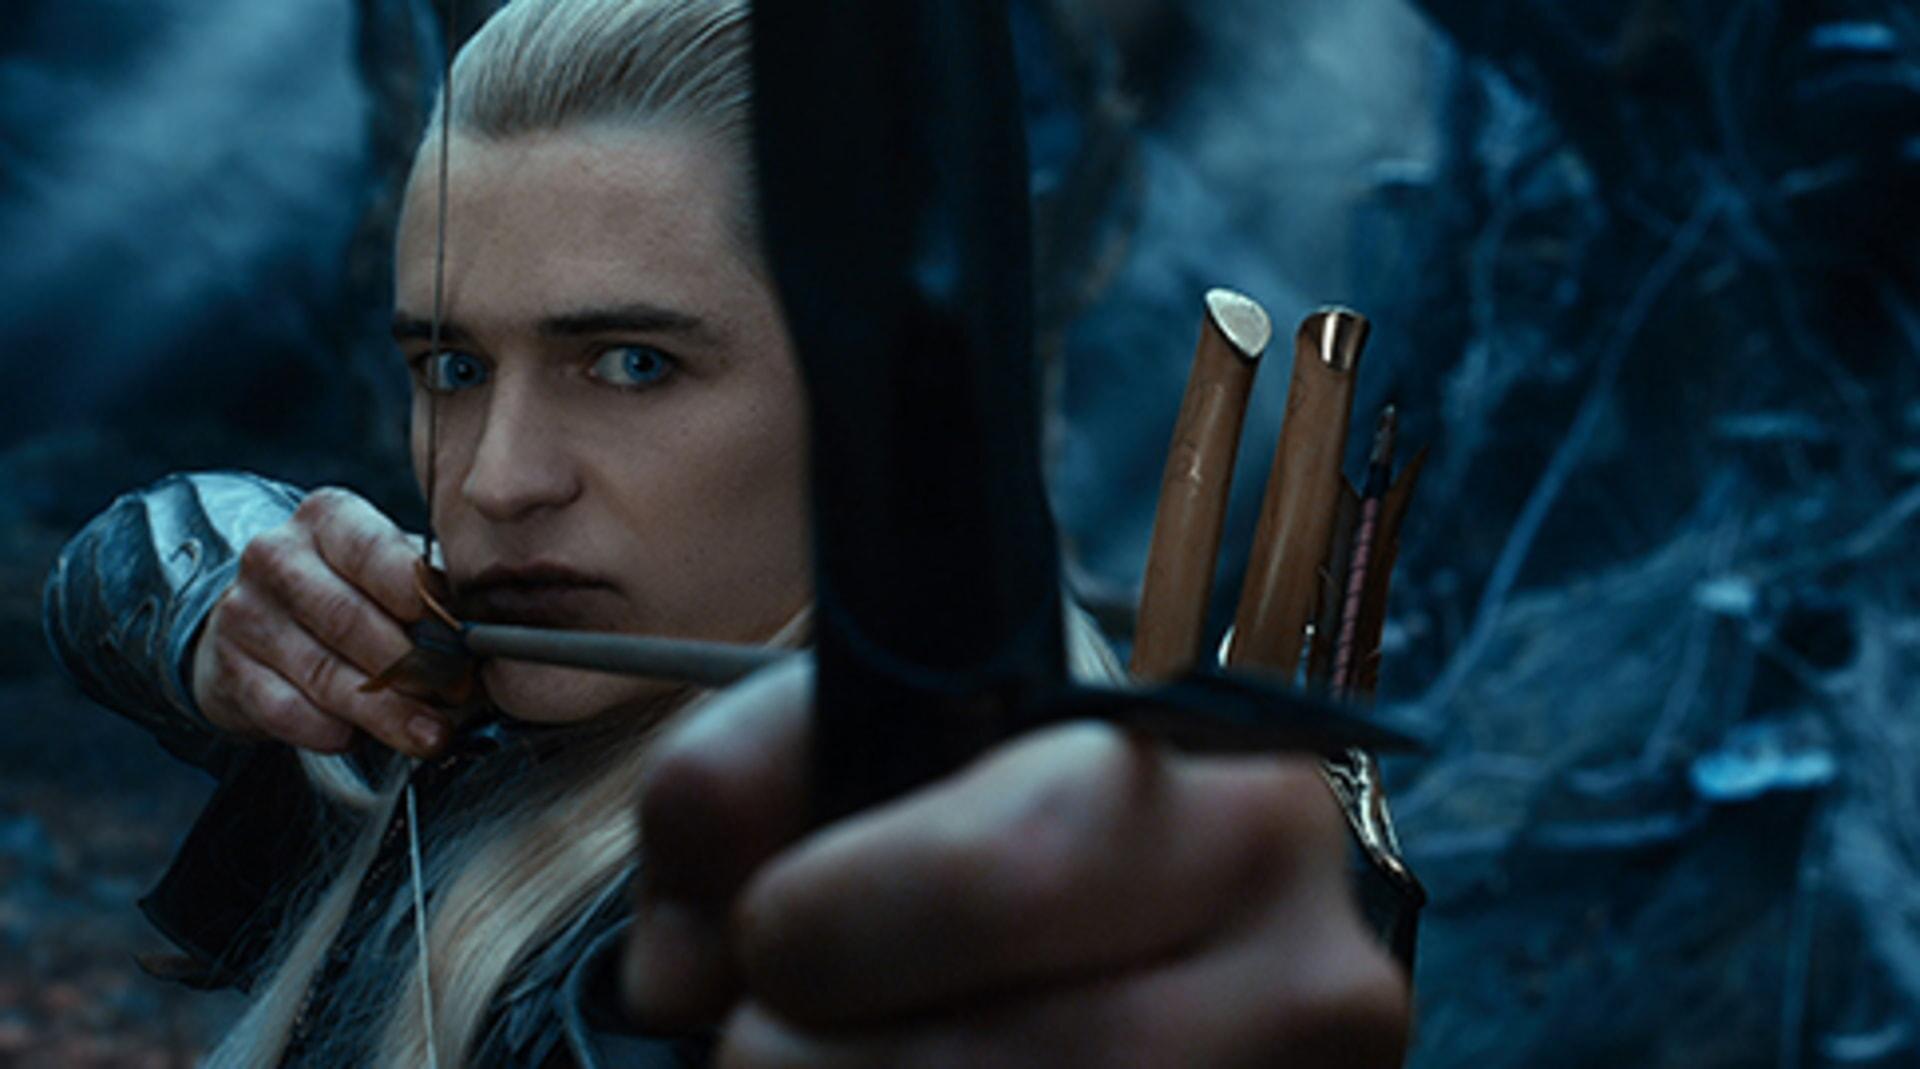 The Hobbit: The Desolation of Smaug - Image 3